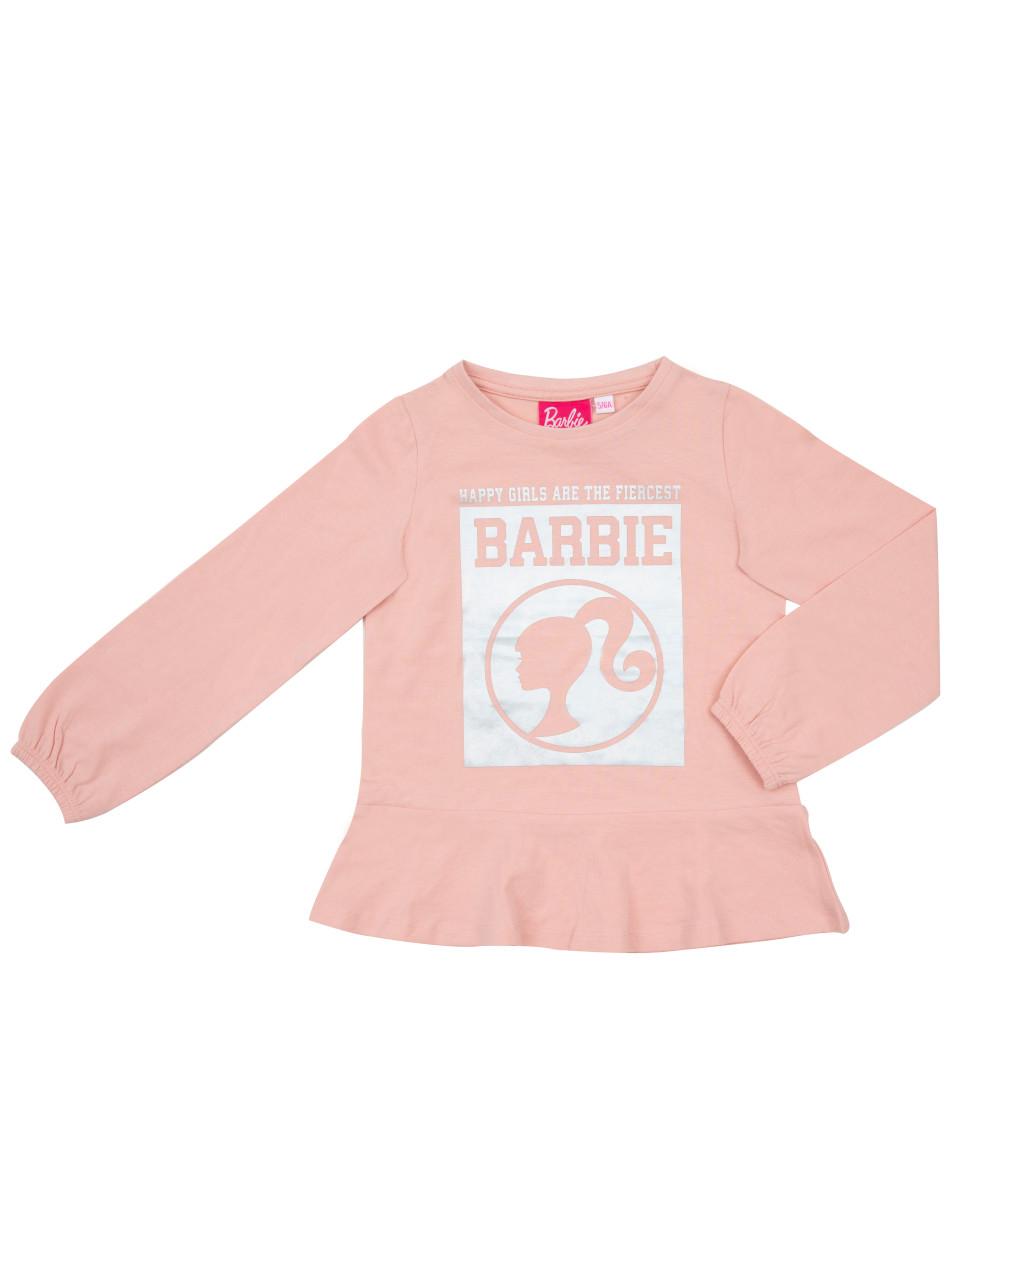 T-shirt rosa barbie - Prénatal